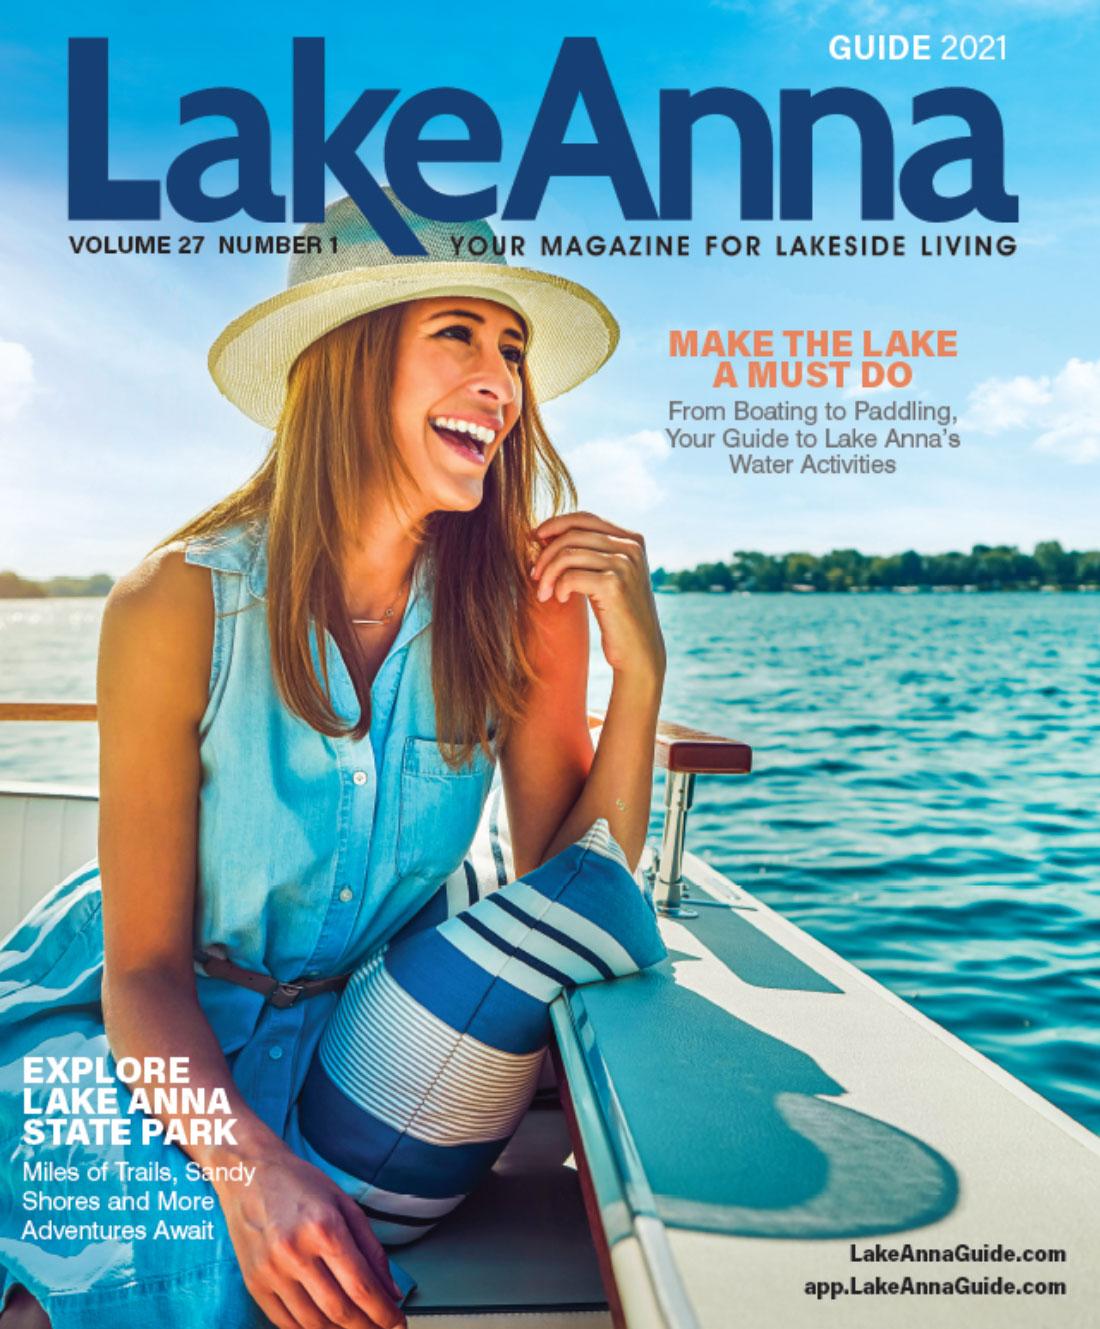 lake anna visitrs guide cover 2021